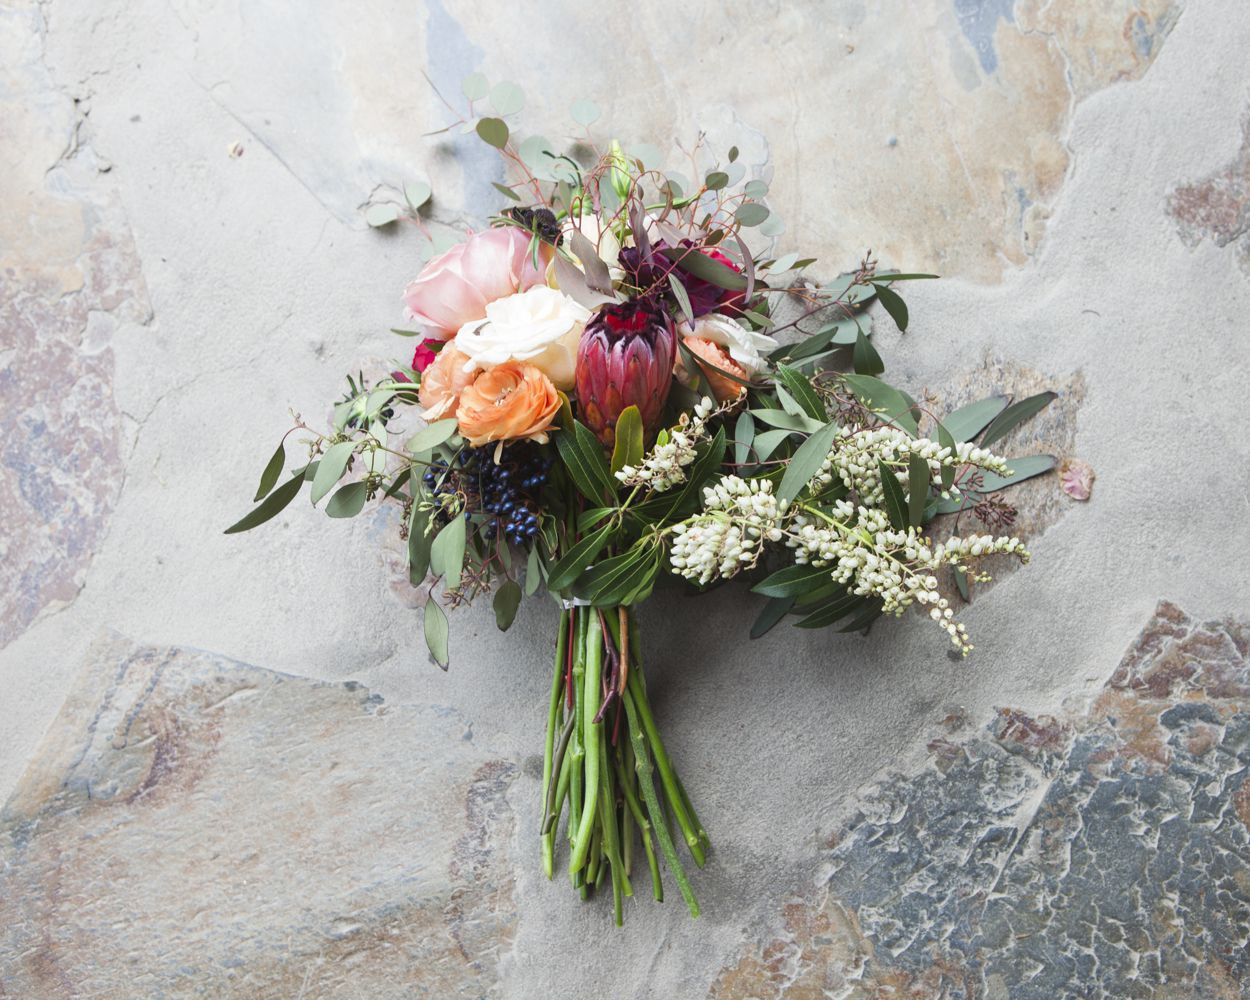 How To Make A Bare Stem Wedding Bouquet